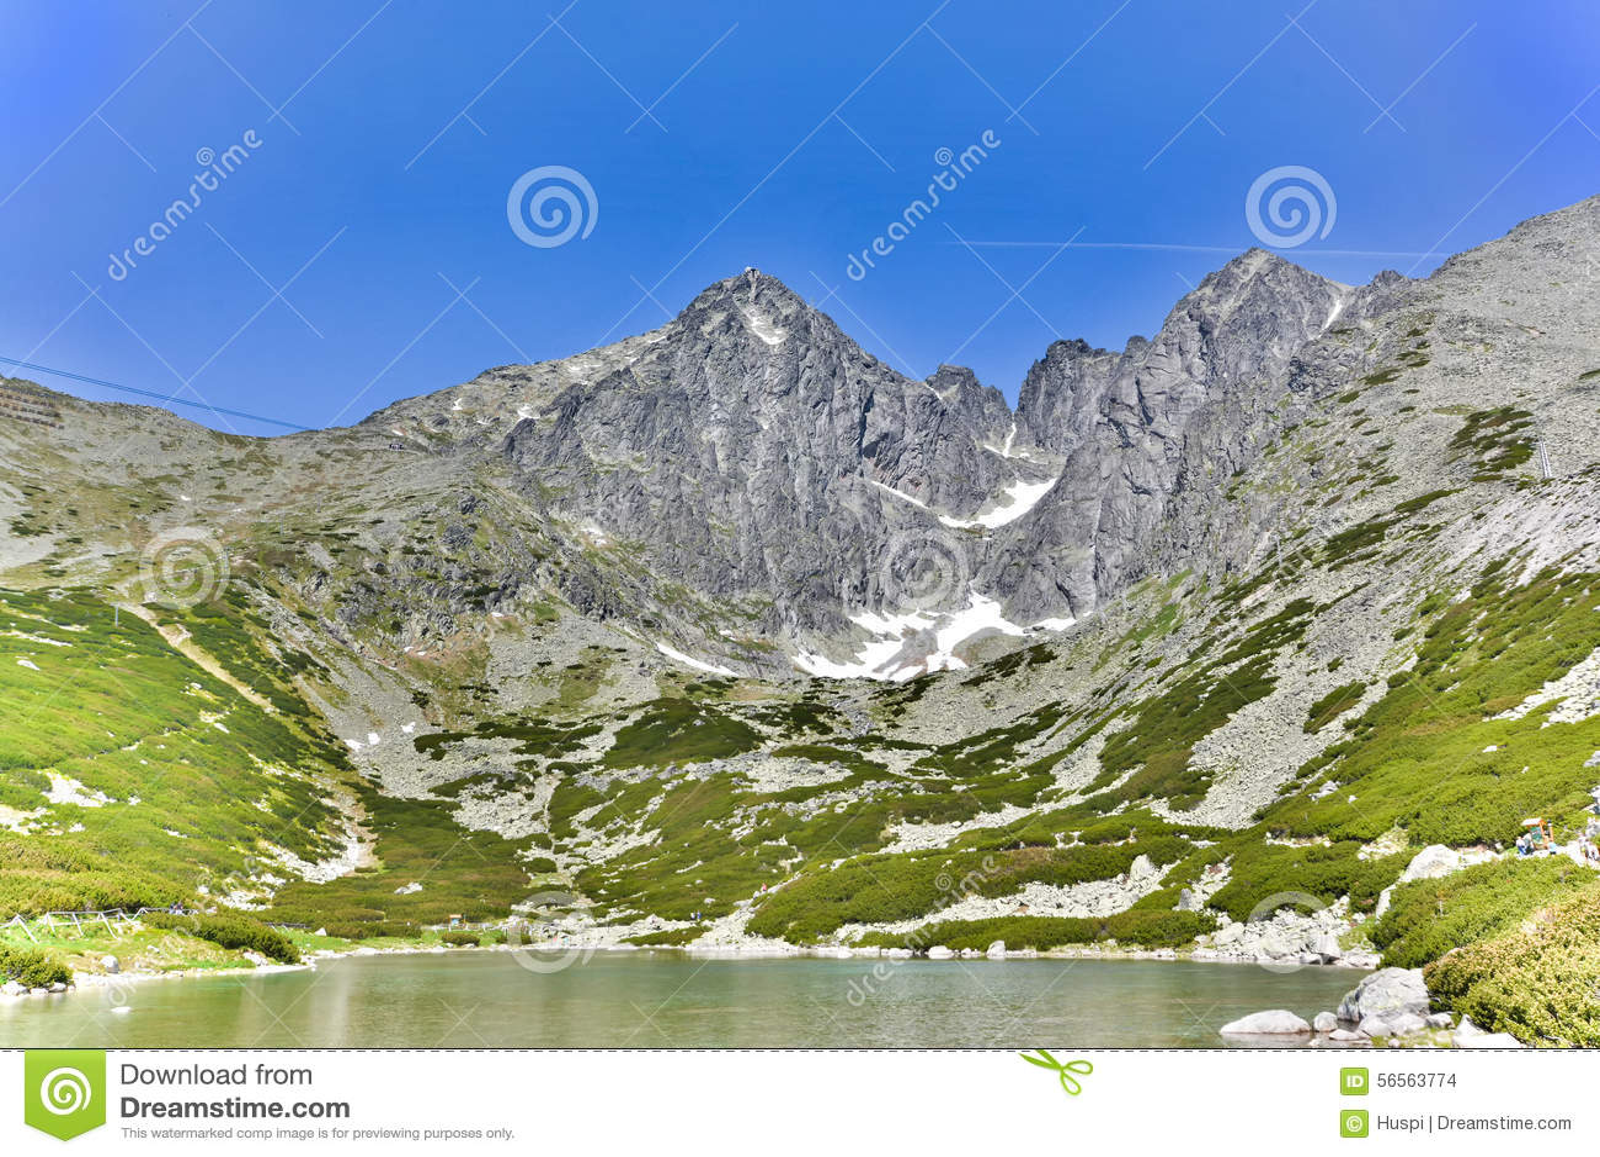 Download Lomnicky Stit, υψηλό Tatras στη Σλοβακία Στοκ Εικόνες - εικόνα από φύση, βουνό: 56563774